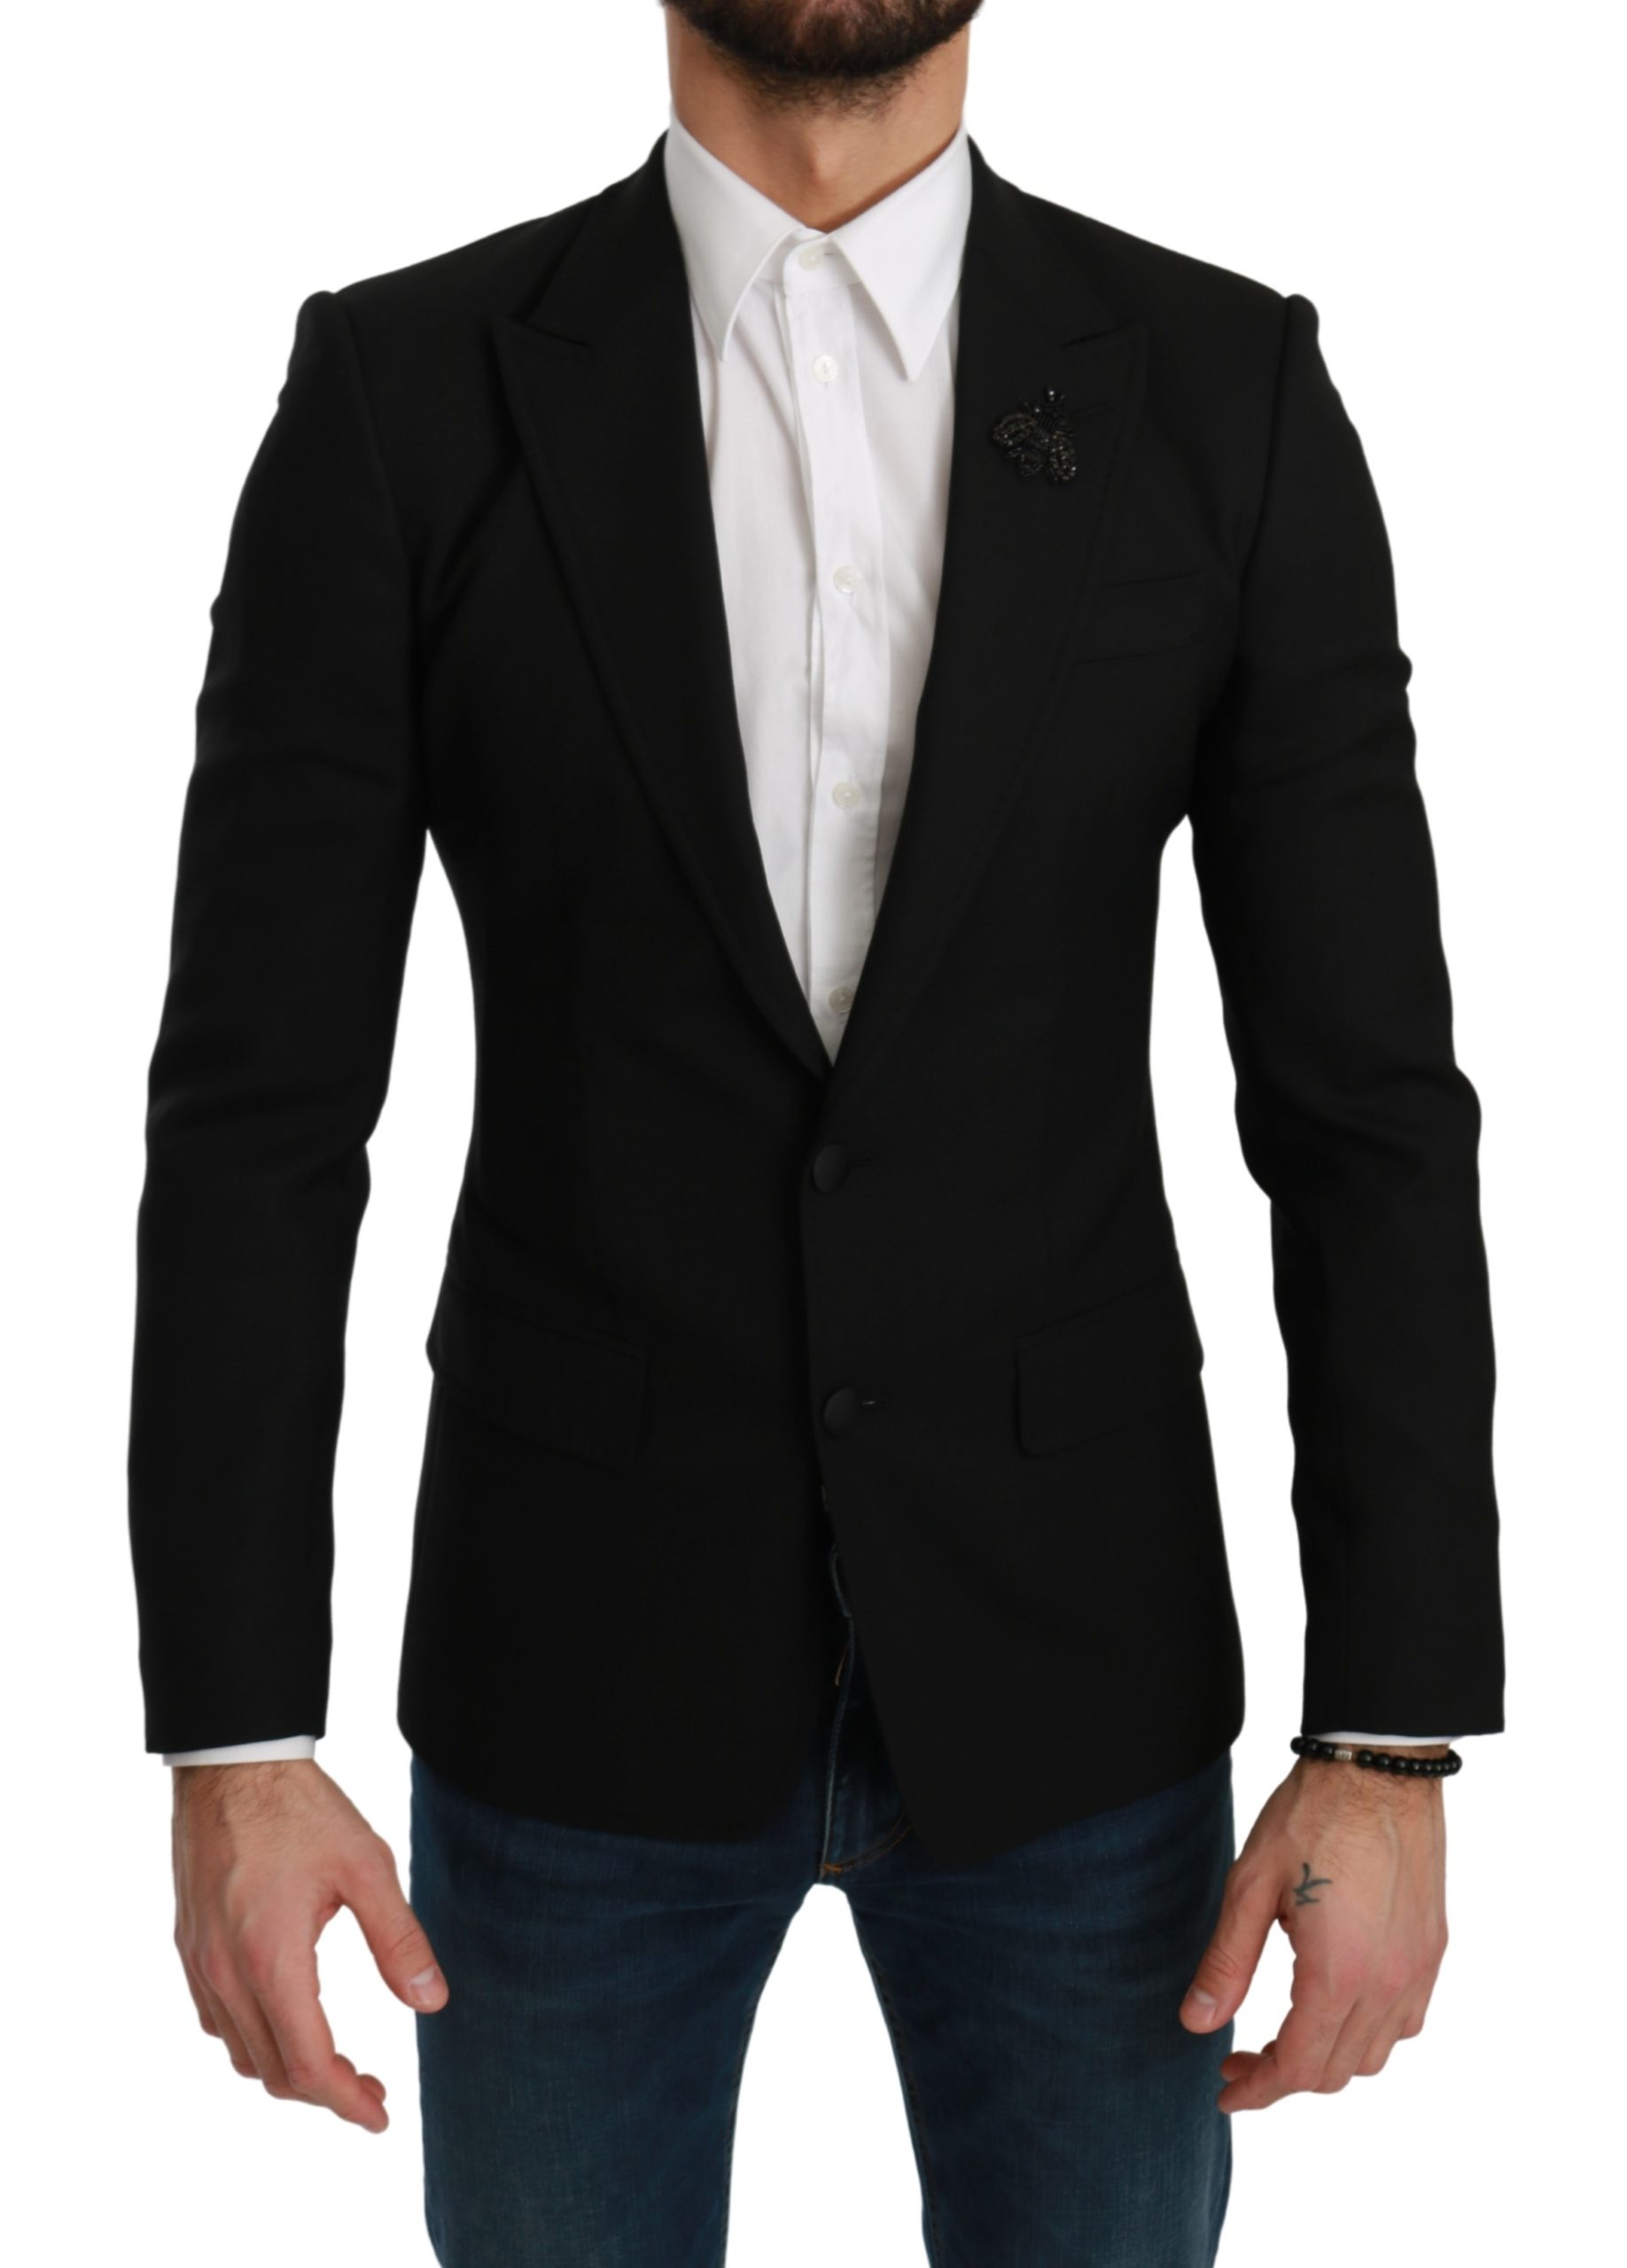 Dolce & Gabbana Men's Stretch Slim Fit Wool Blazer Black KOS1770 - IT44 | XS